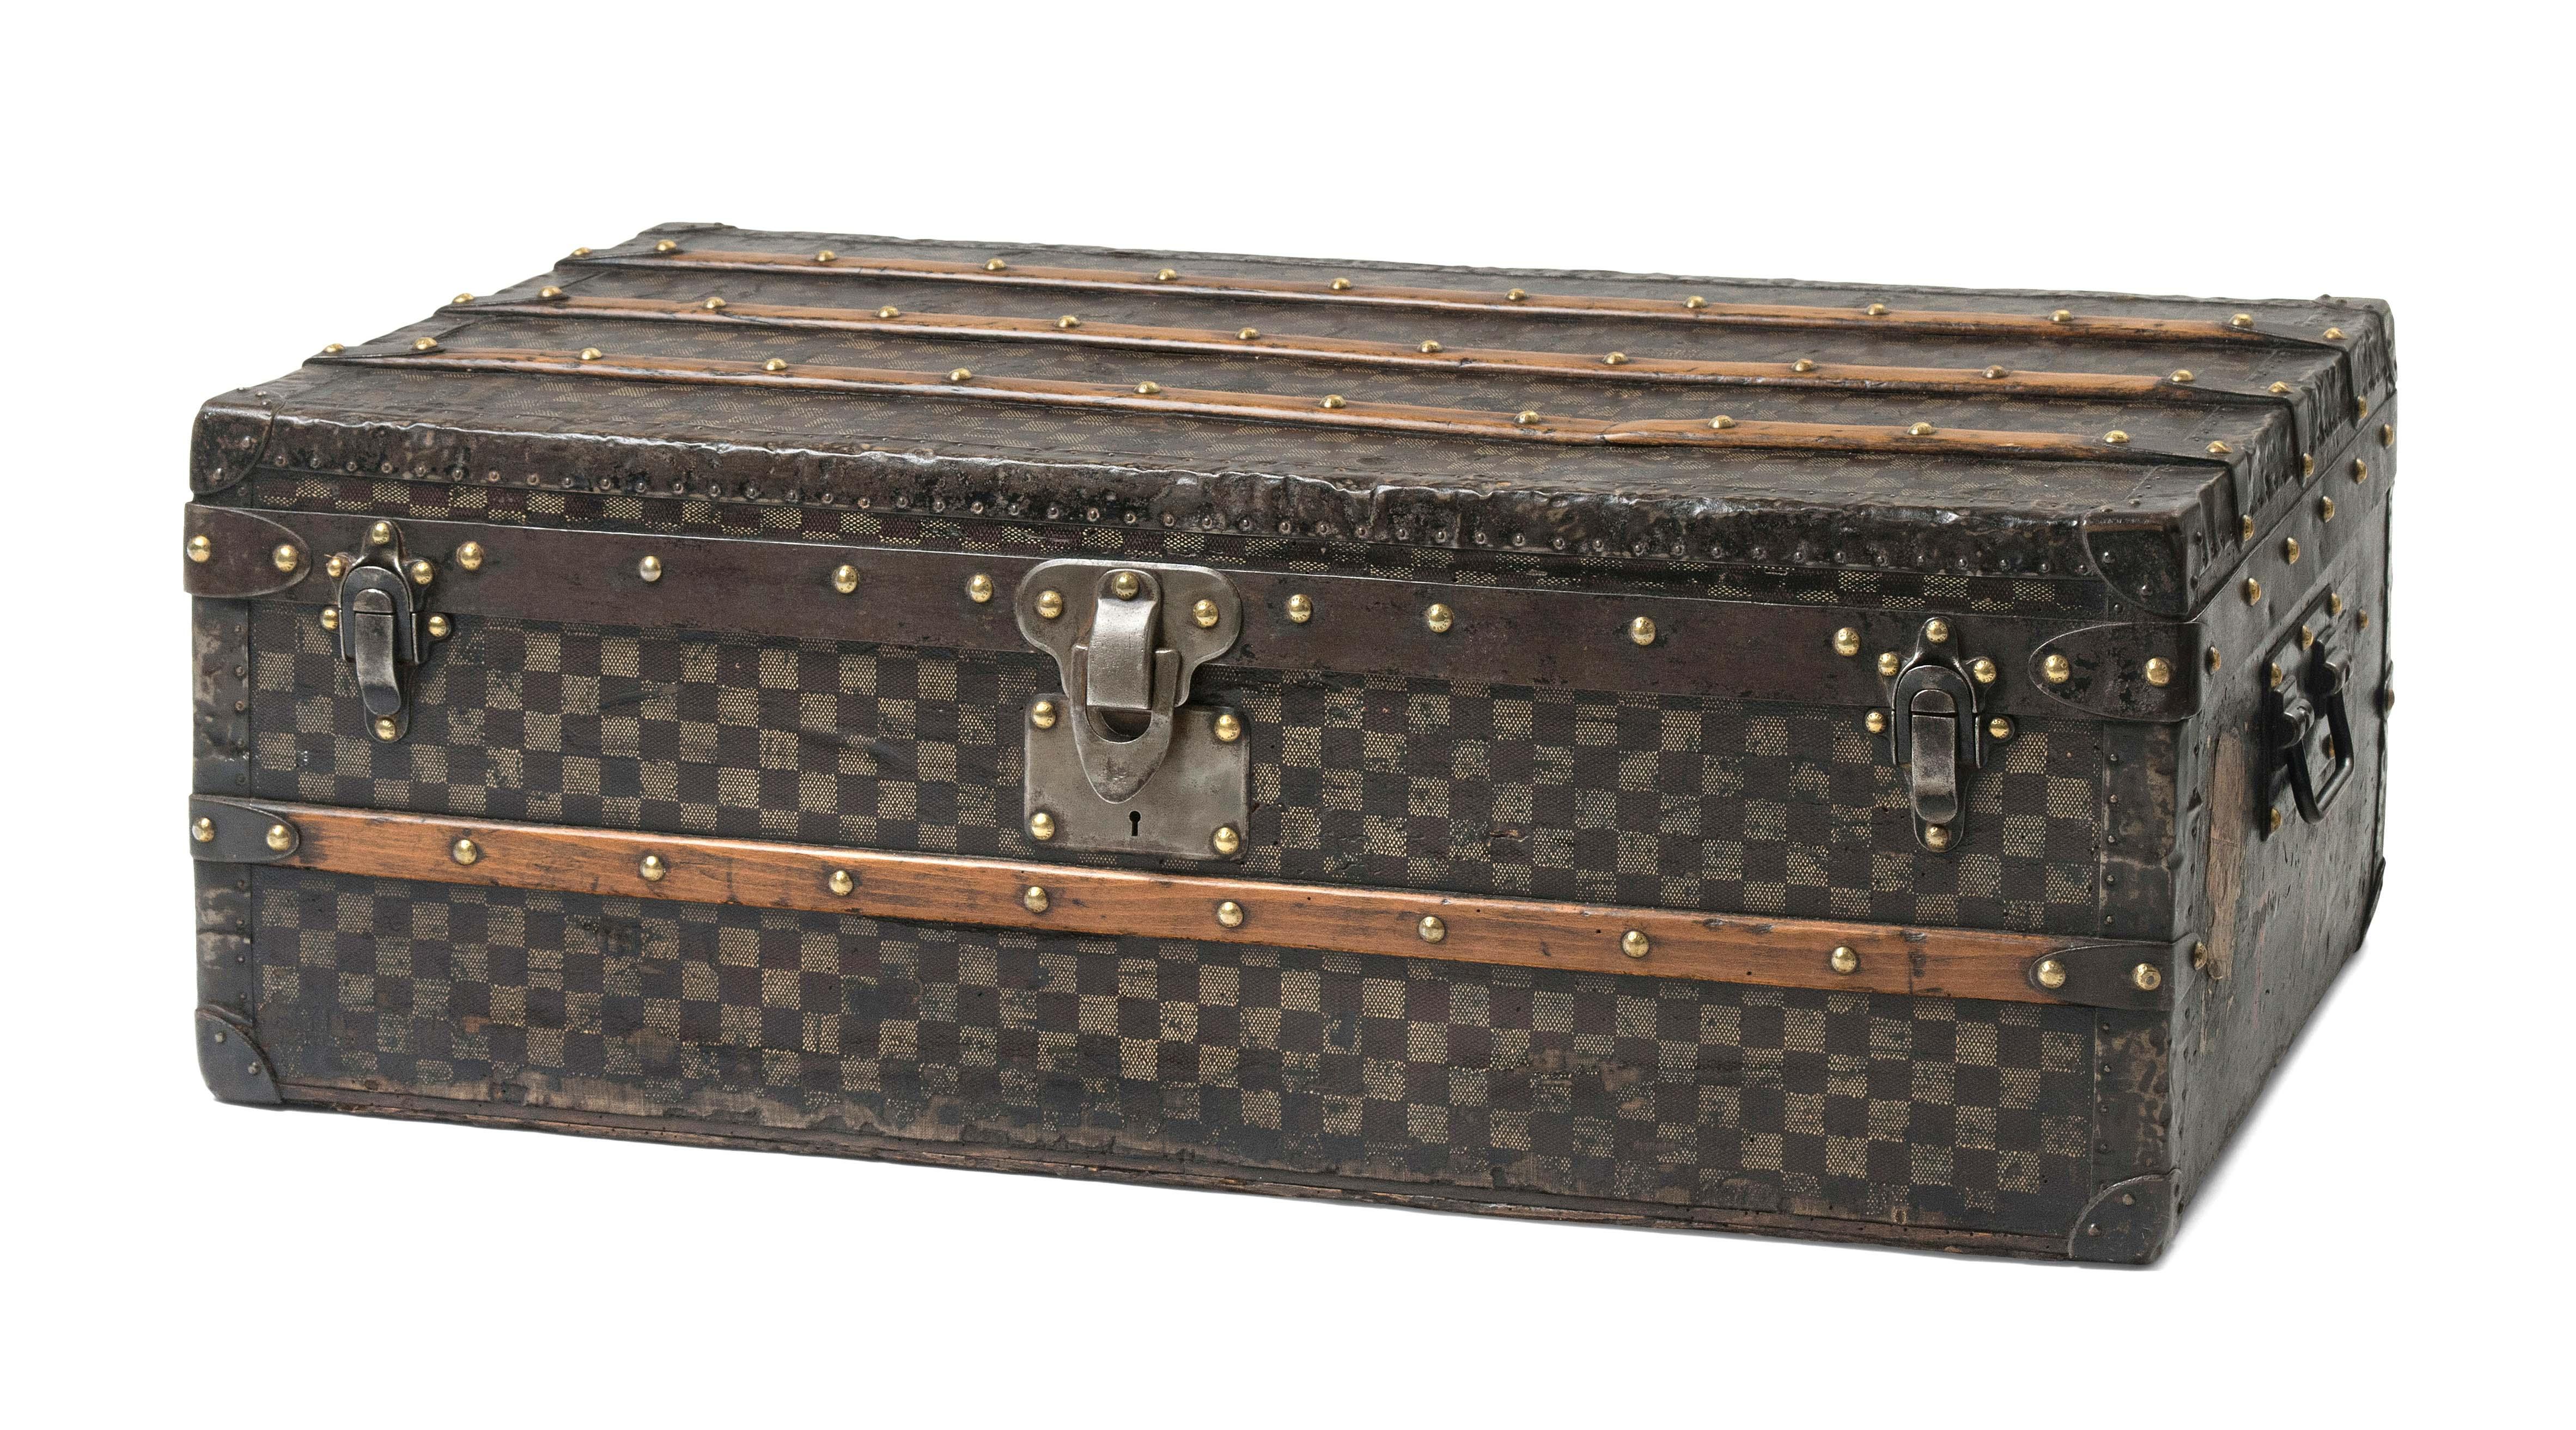 louis vuitton malle cabine 1889 1899 schuler. Black Bedroom Furniture Sets. Home Design Ideas